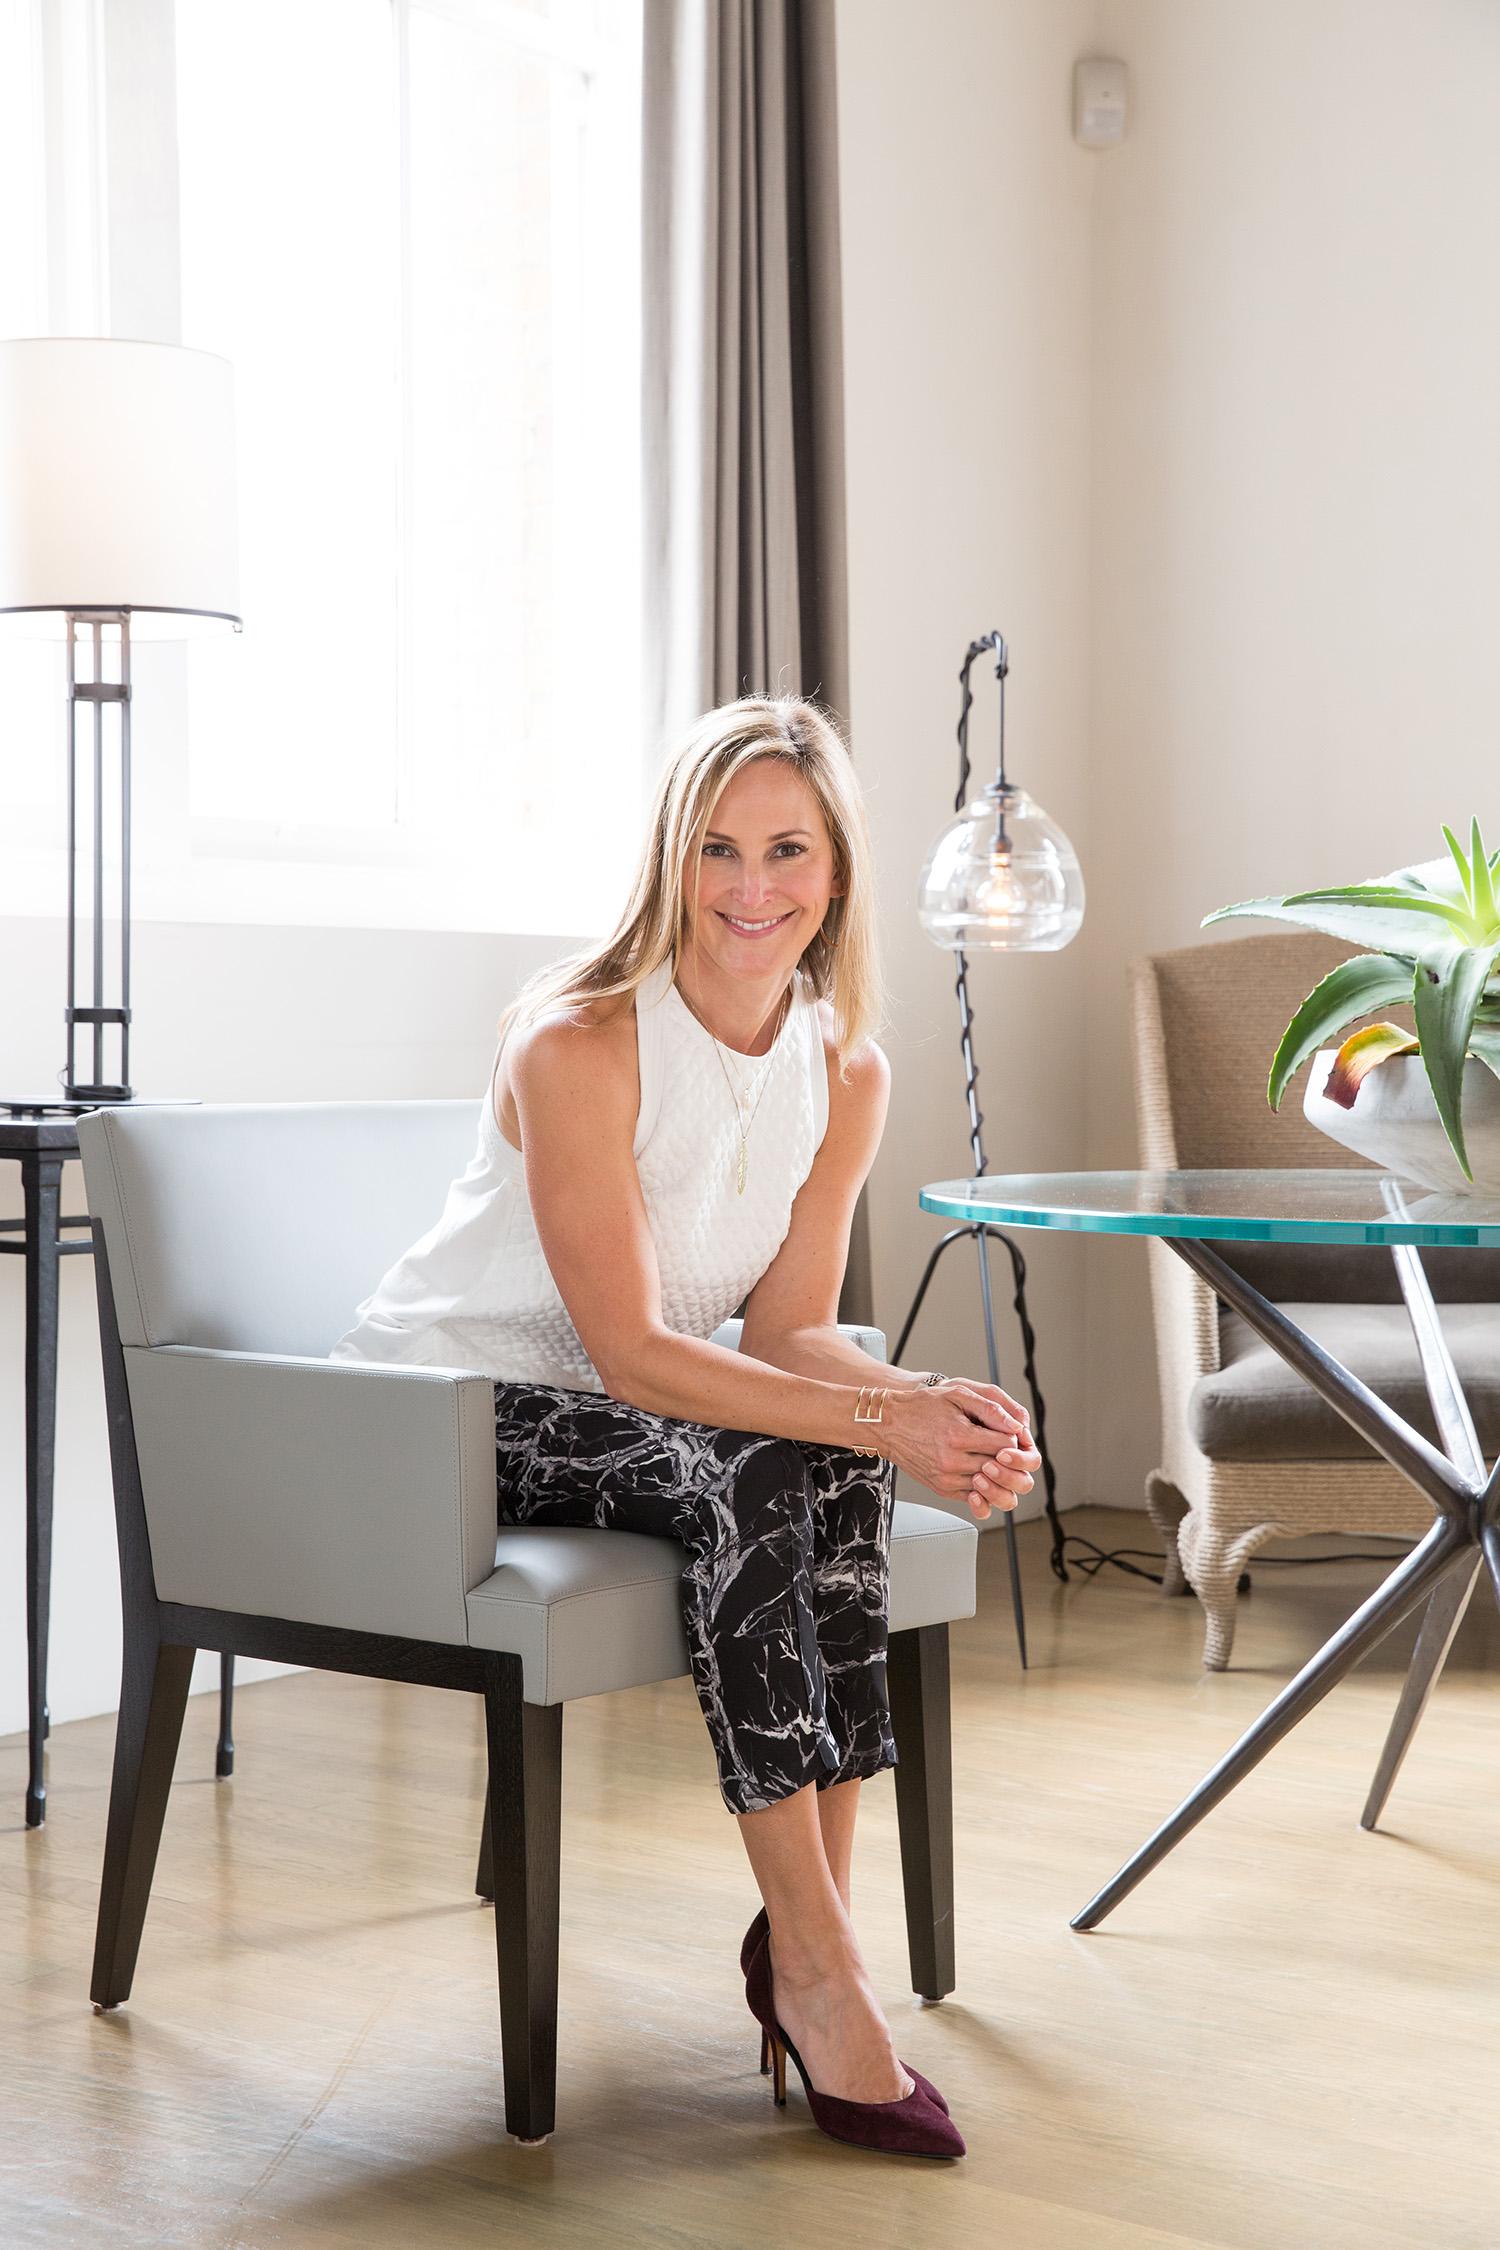 96b11d6566aca 5 Minutes With Interior Designer Julie Rootes | Rue